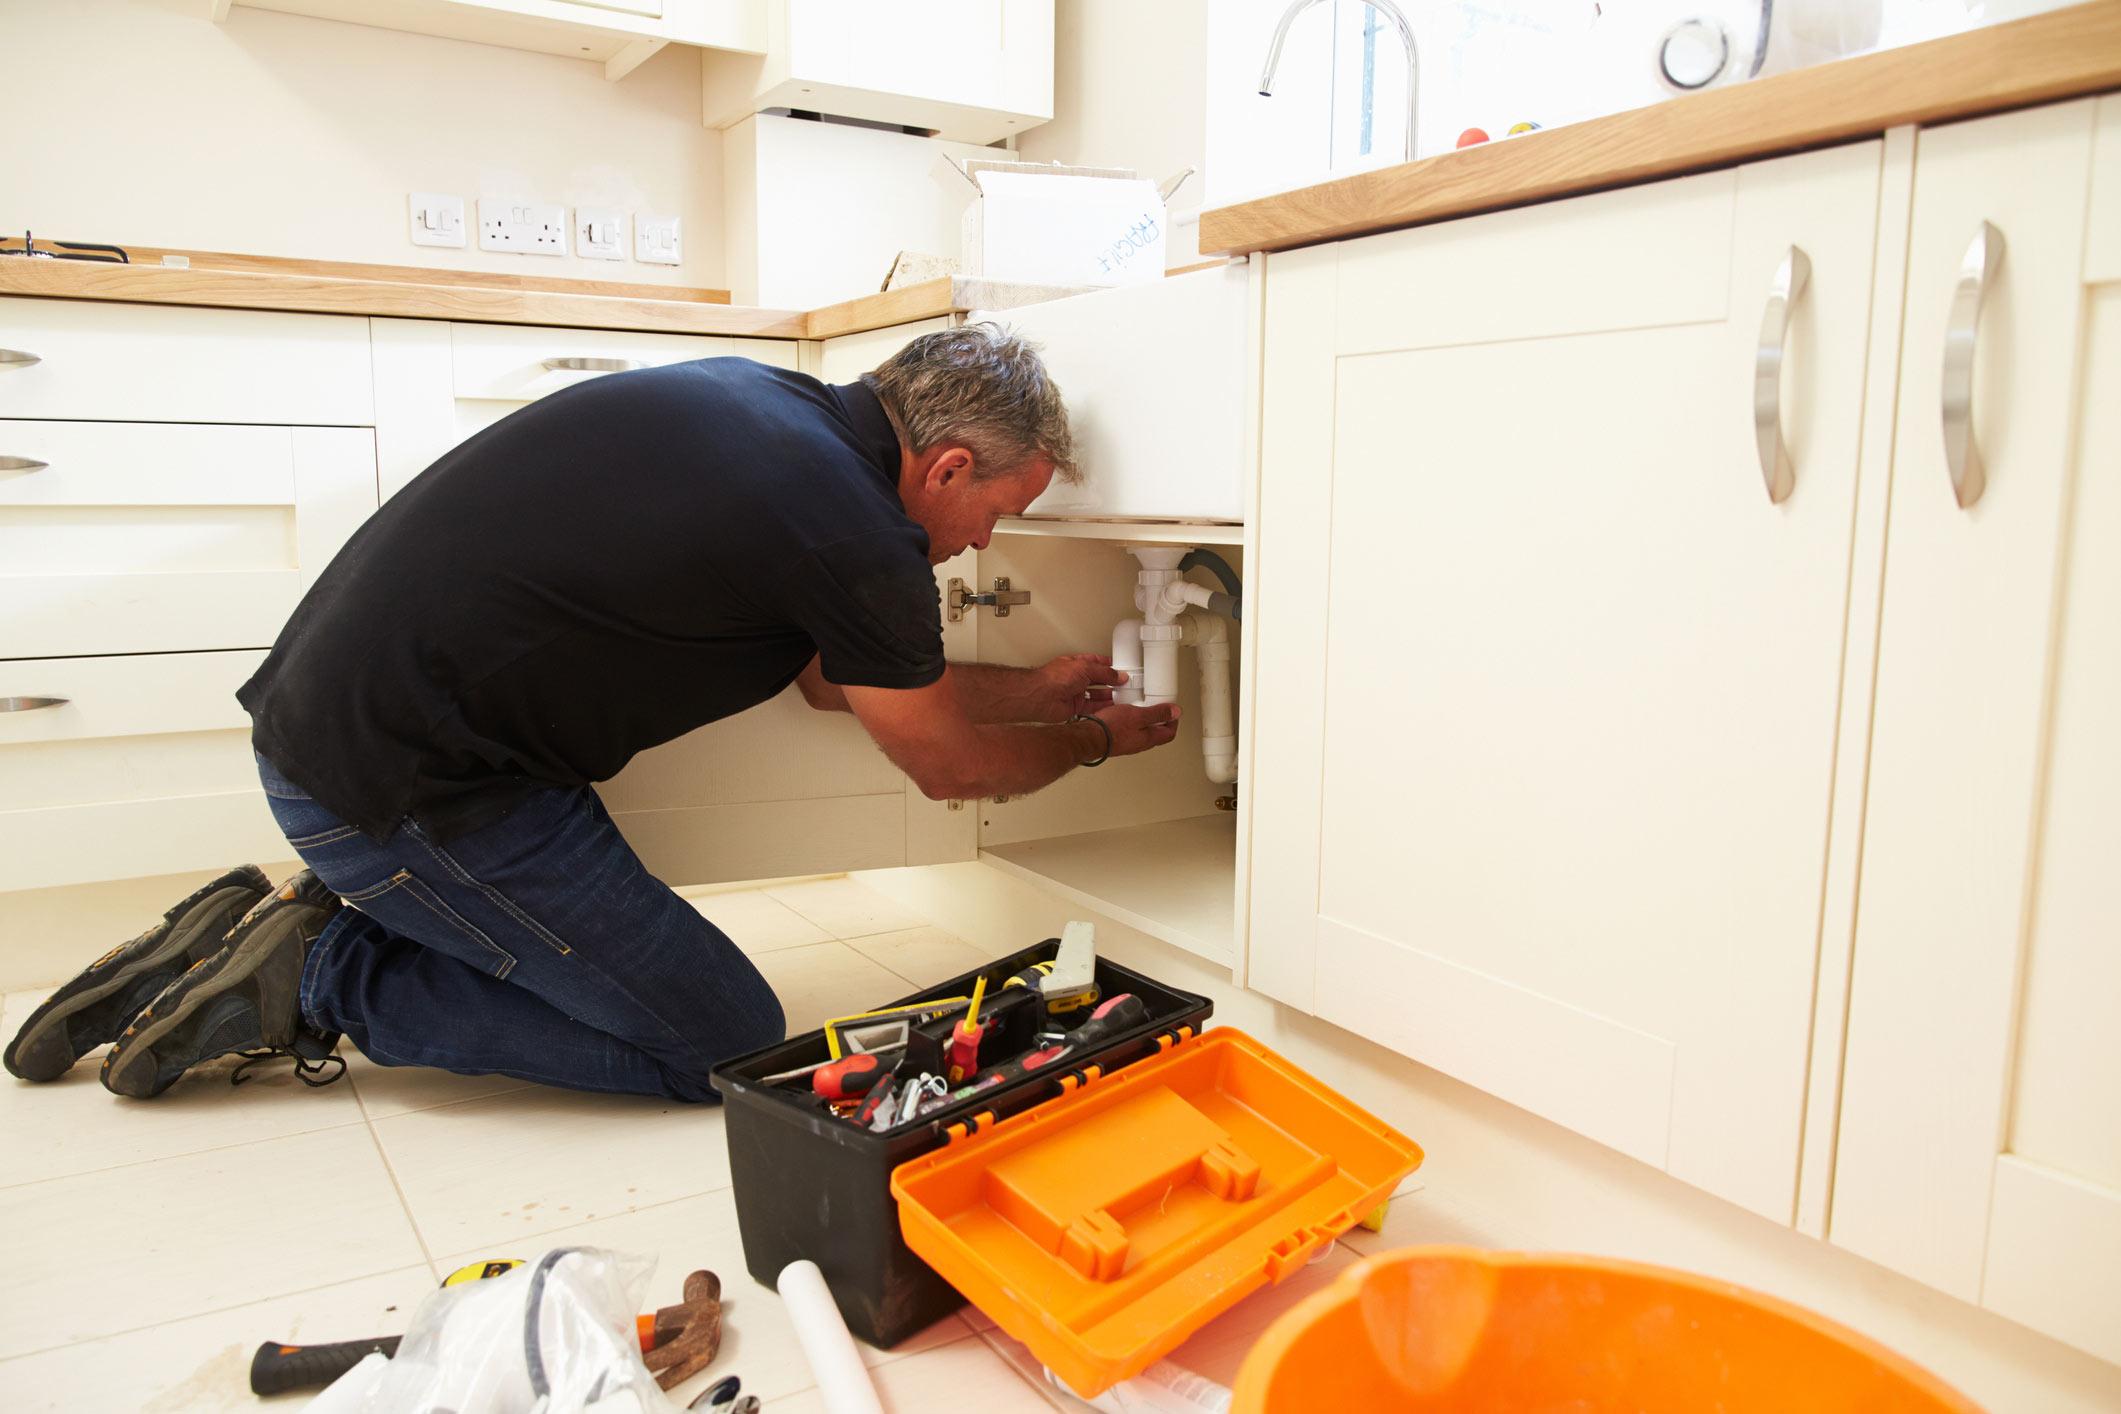 North Devon plumber fixing leaking tap